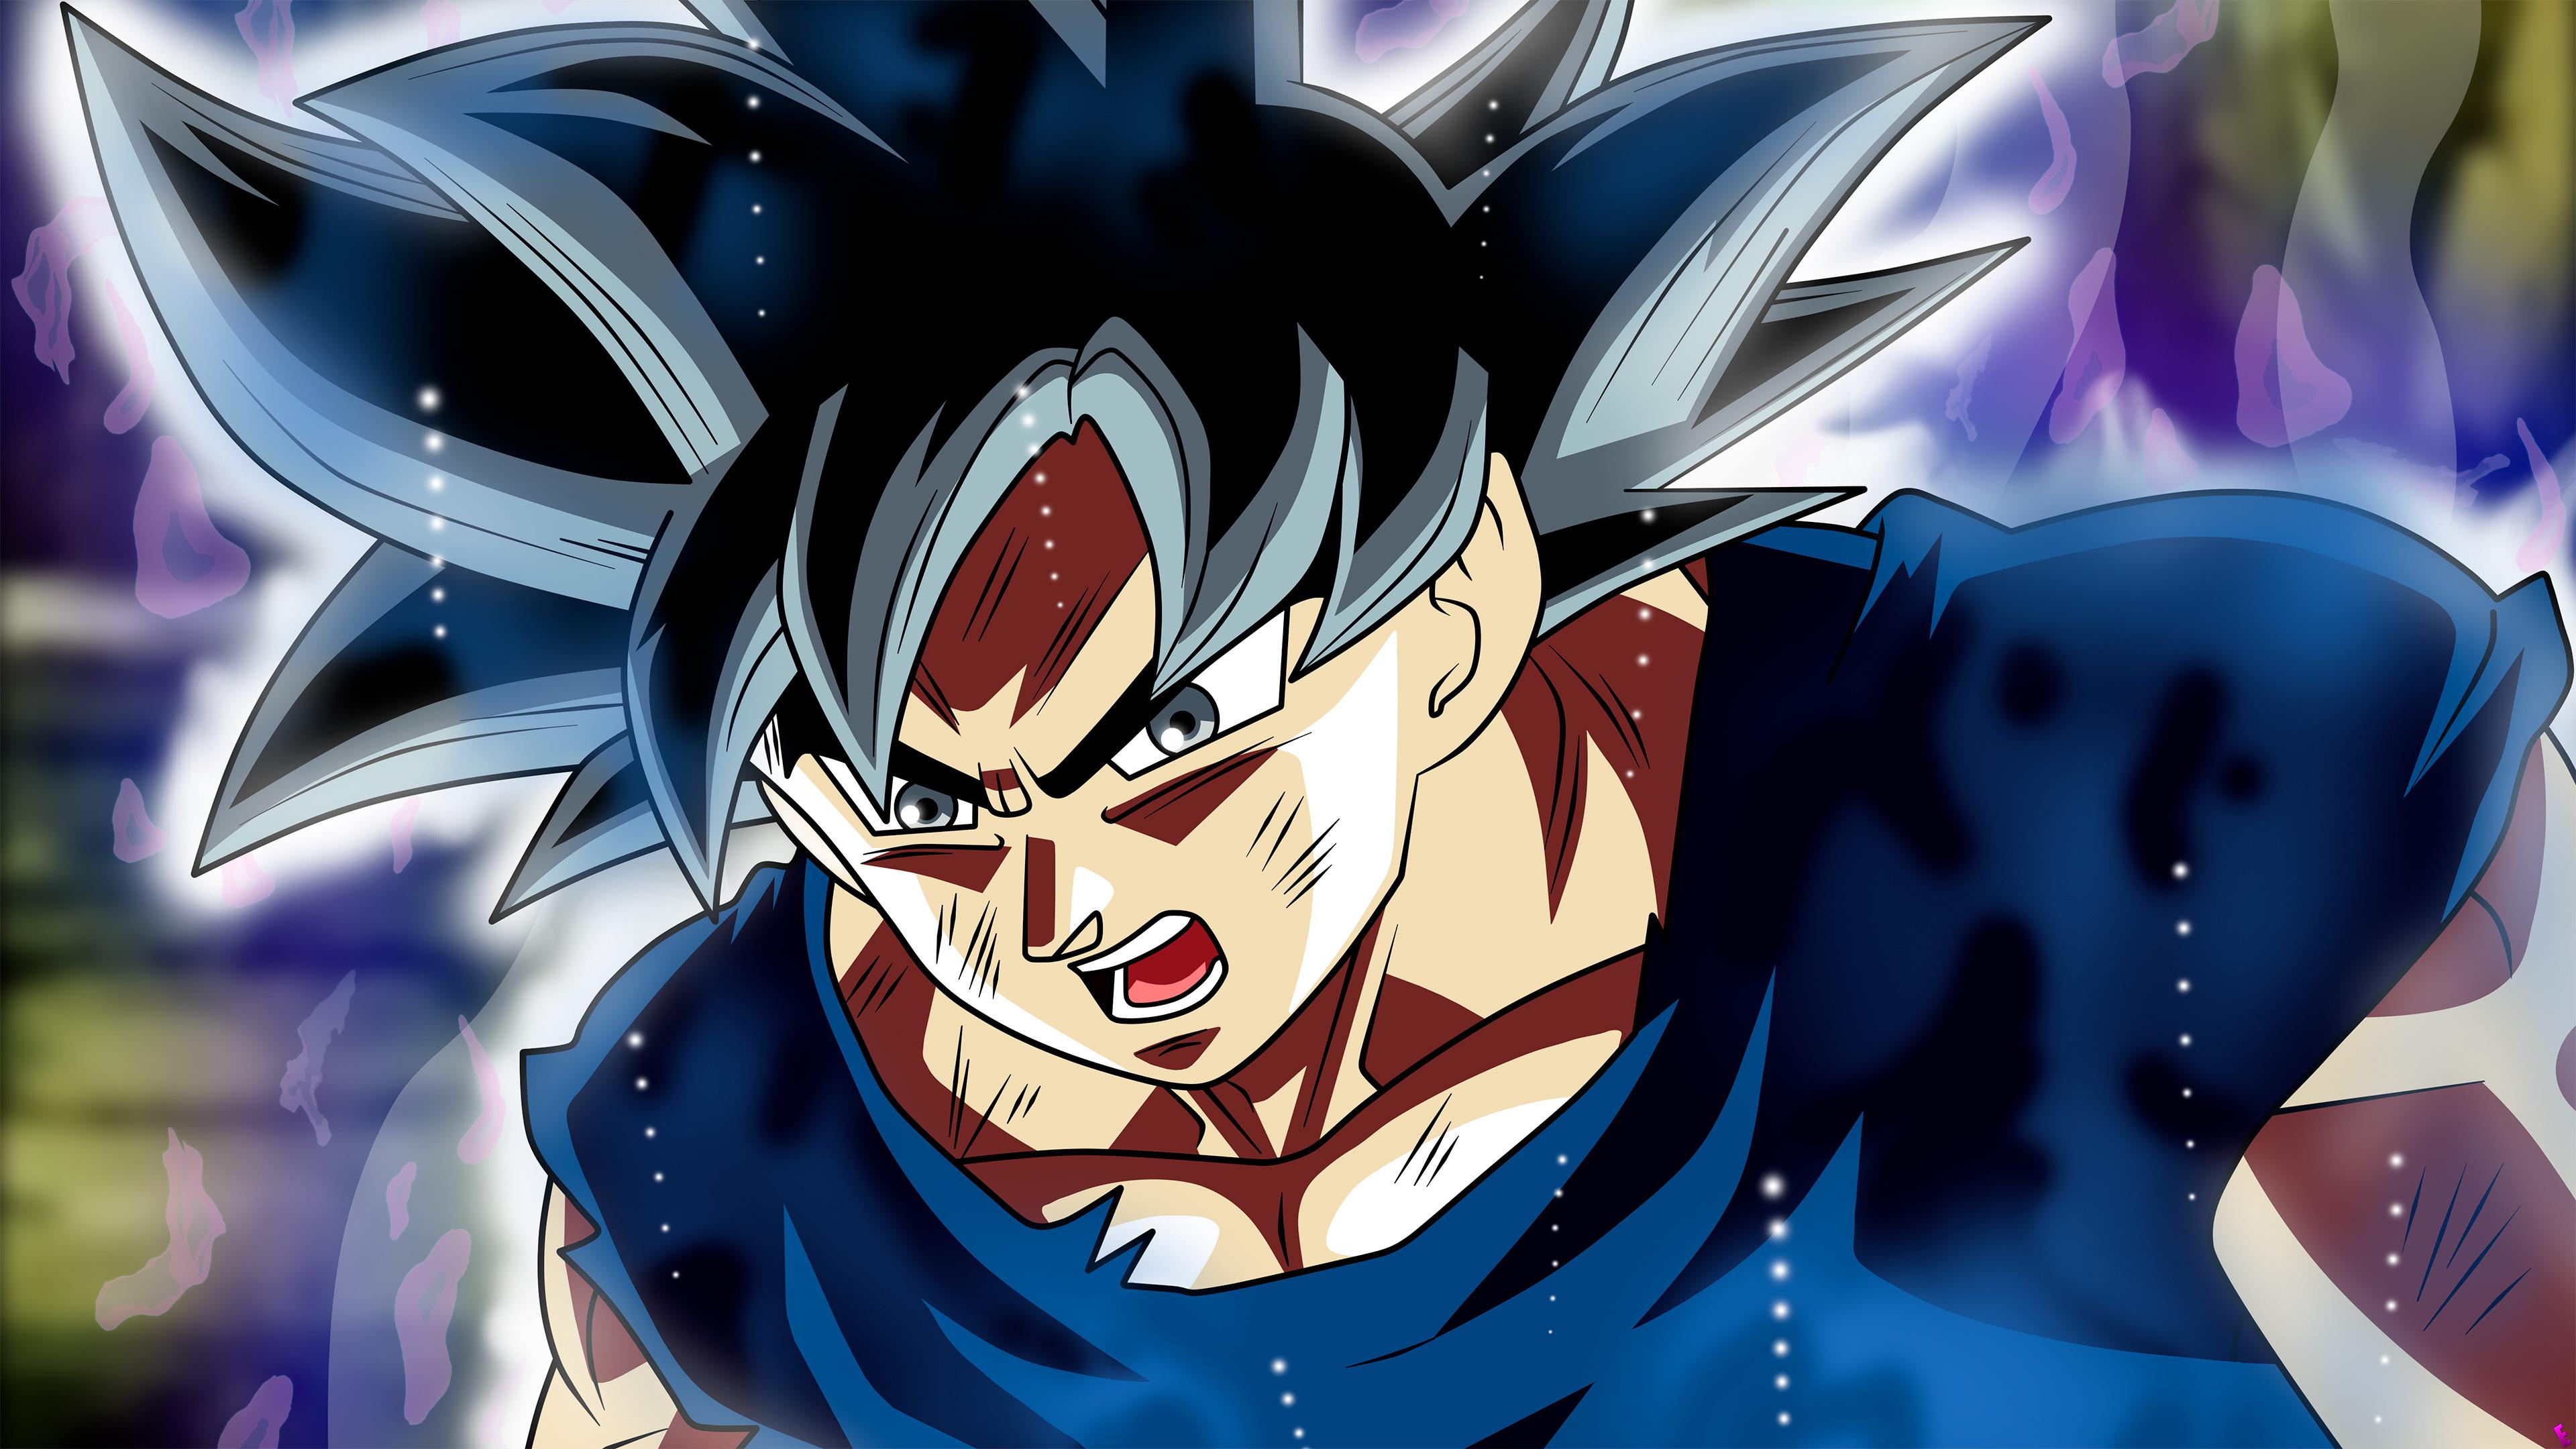 Goku 4k hd anime 4k wallpapers images backgrounds - Goku wallpaper 4k ...